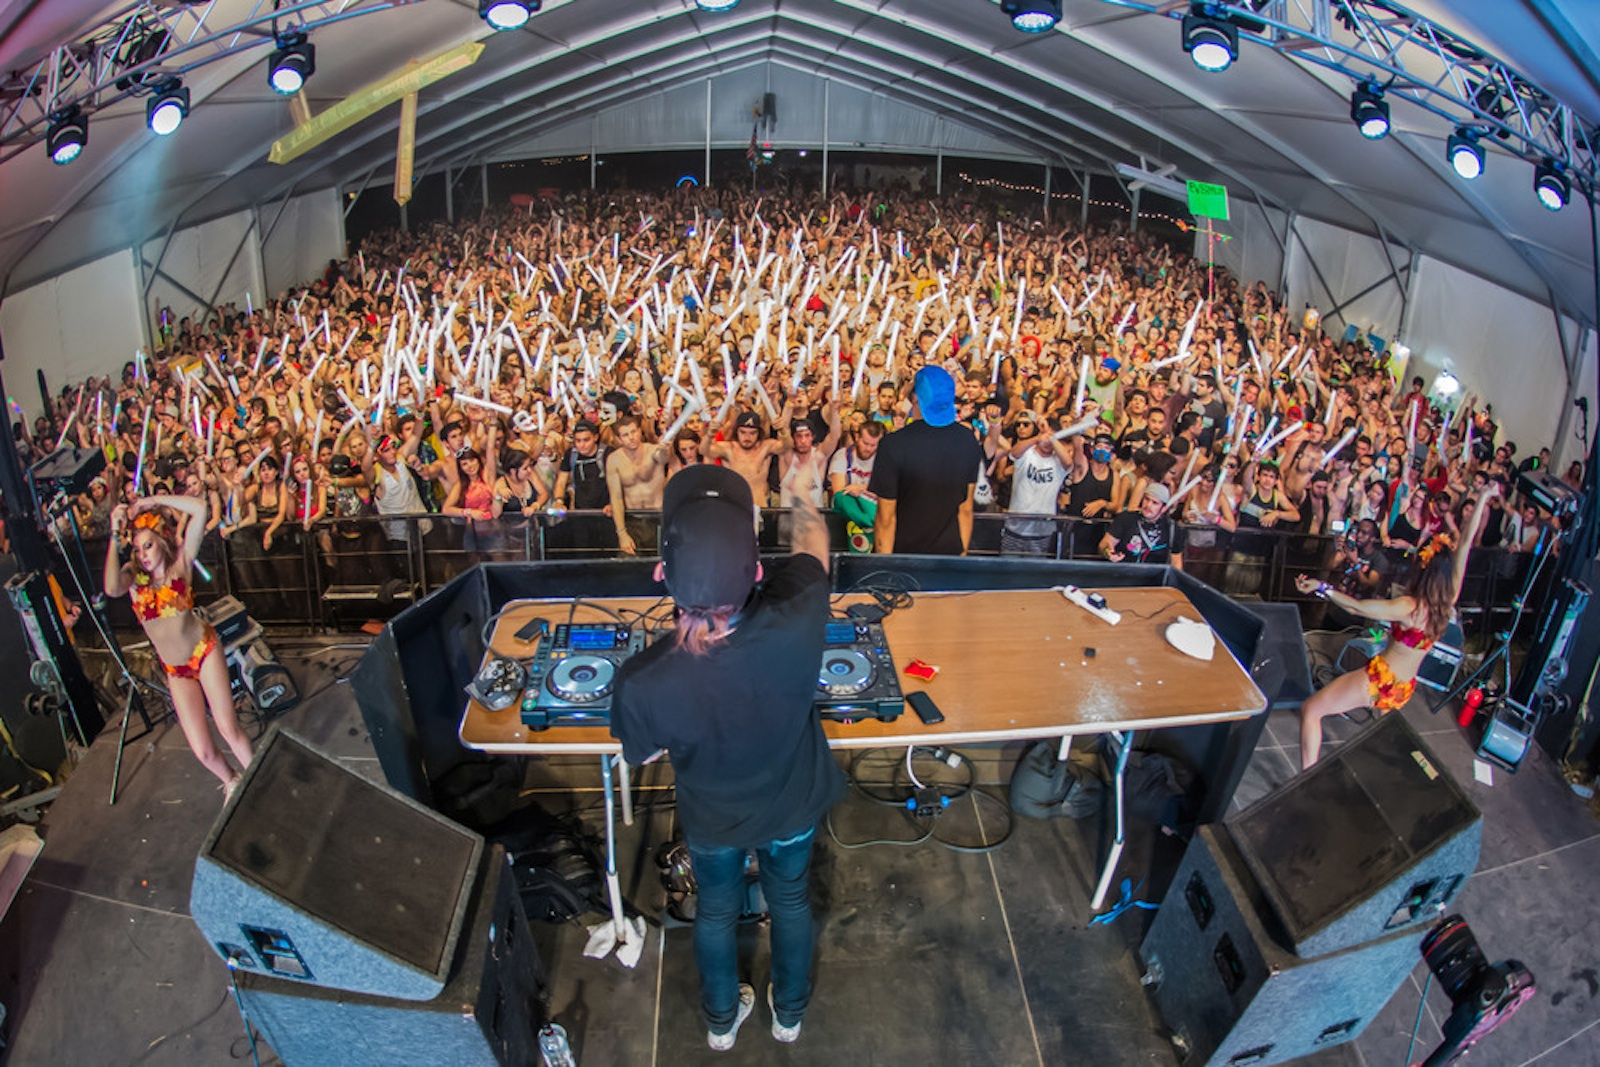 Seeking Euphoria at Austin's New Spring EDM Festival   Everfest